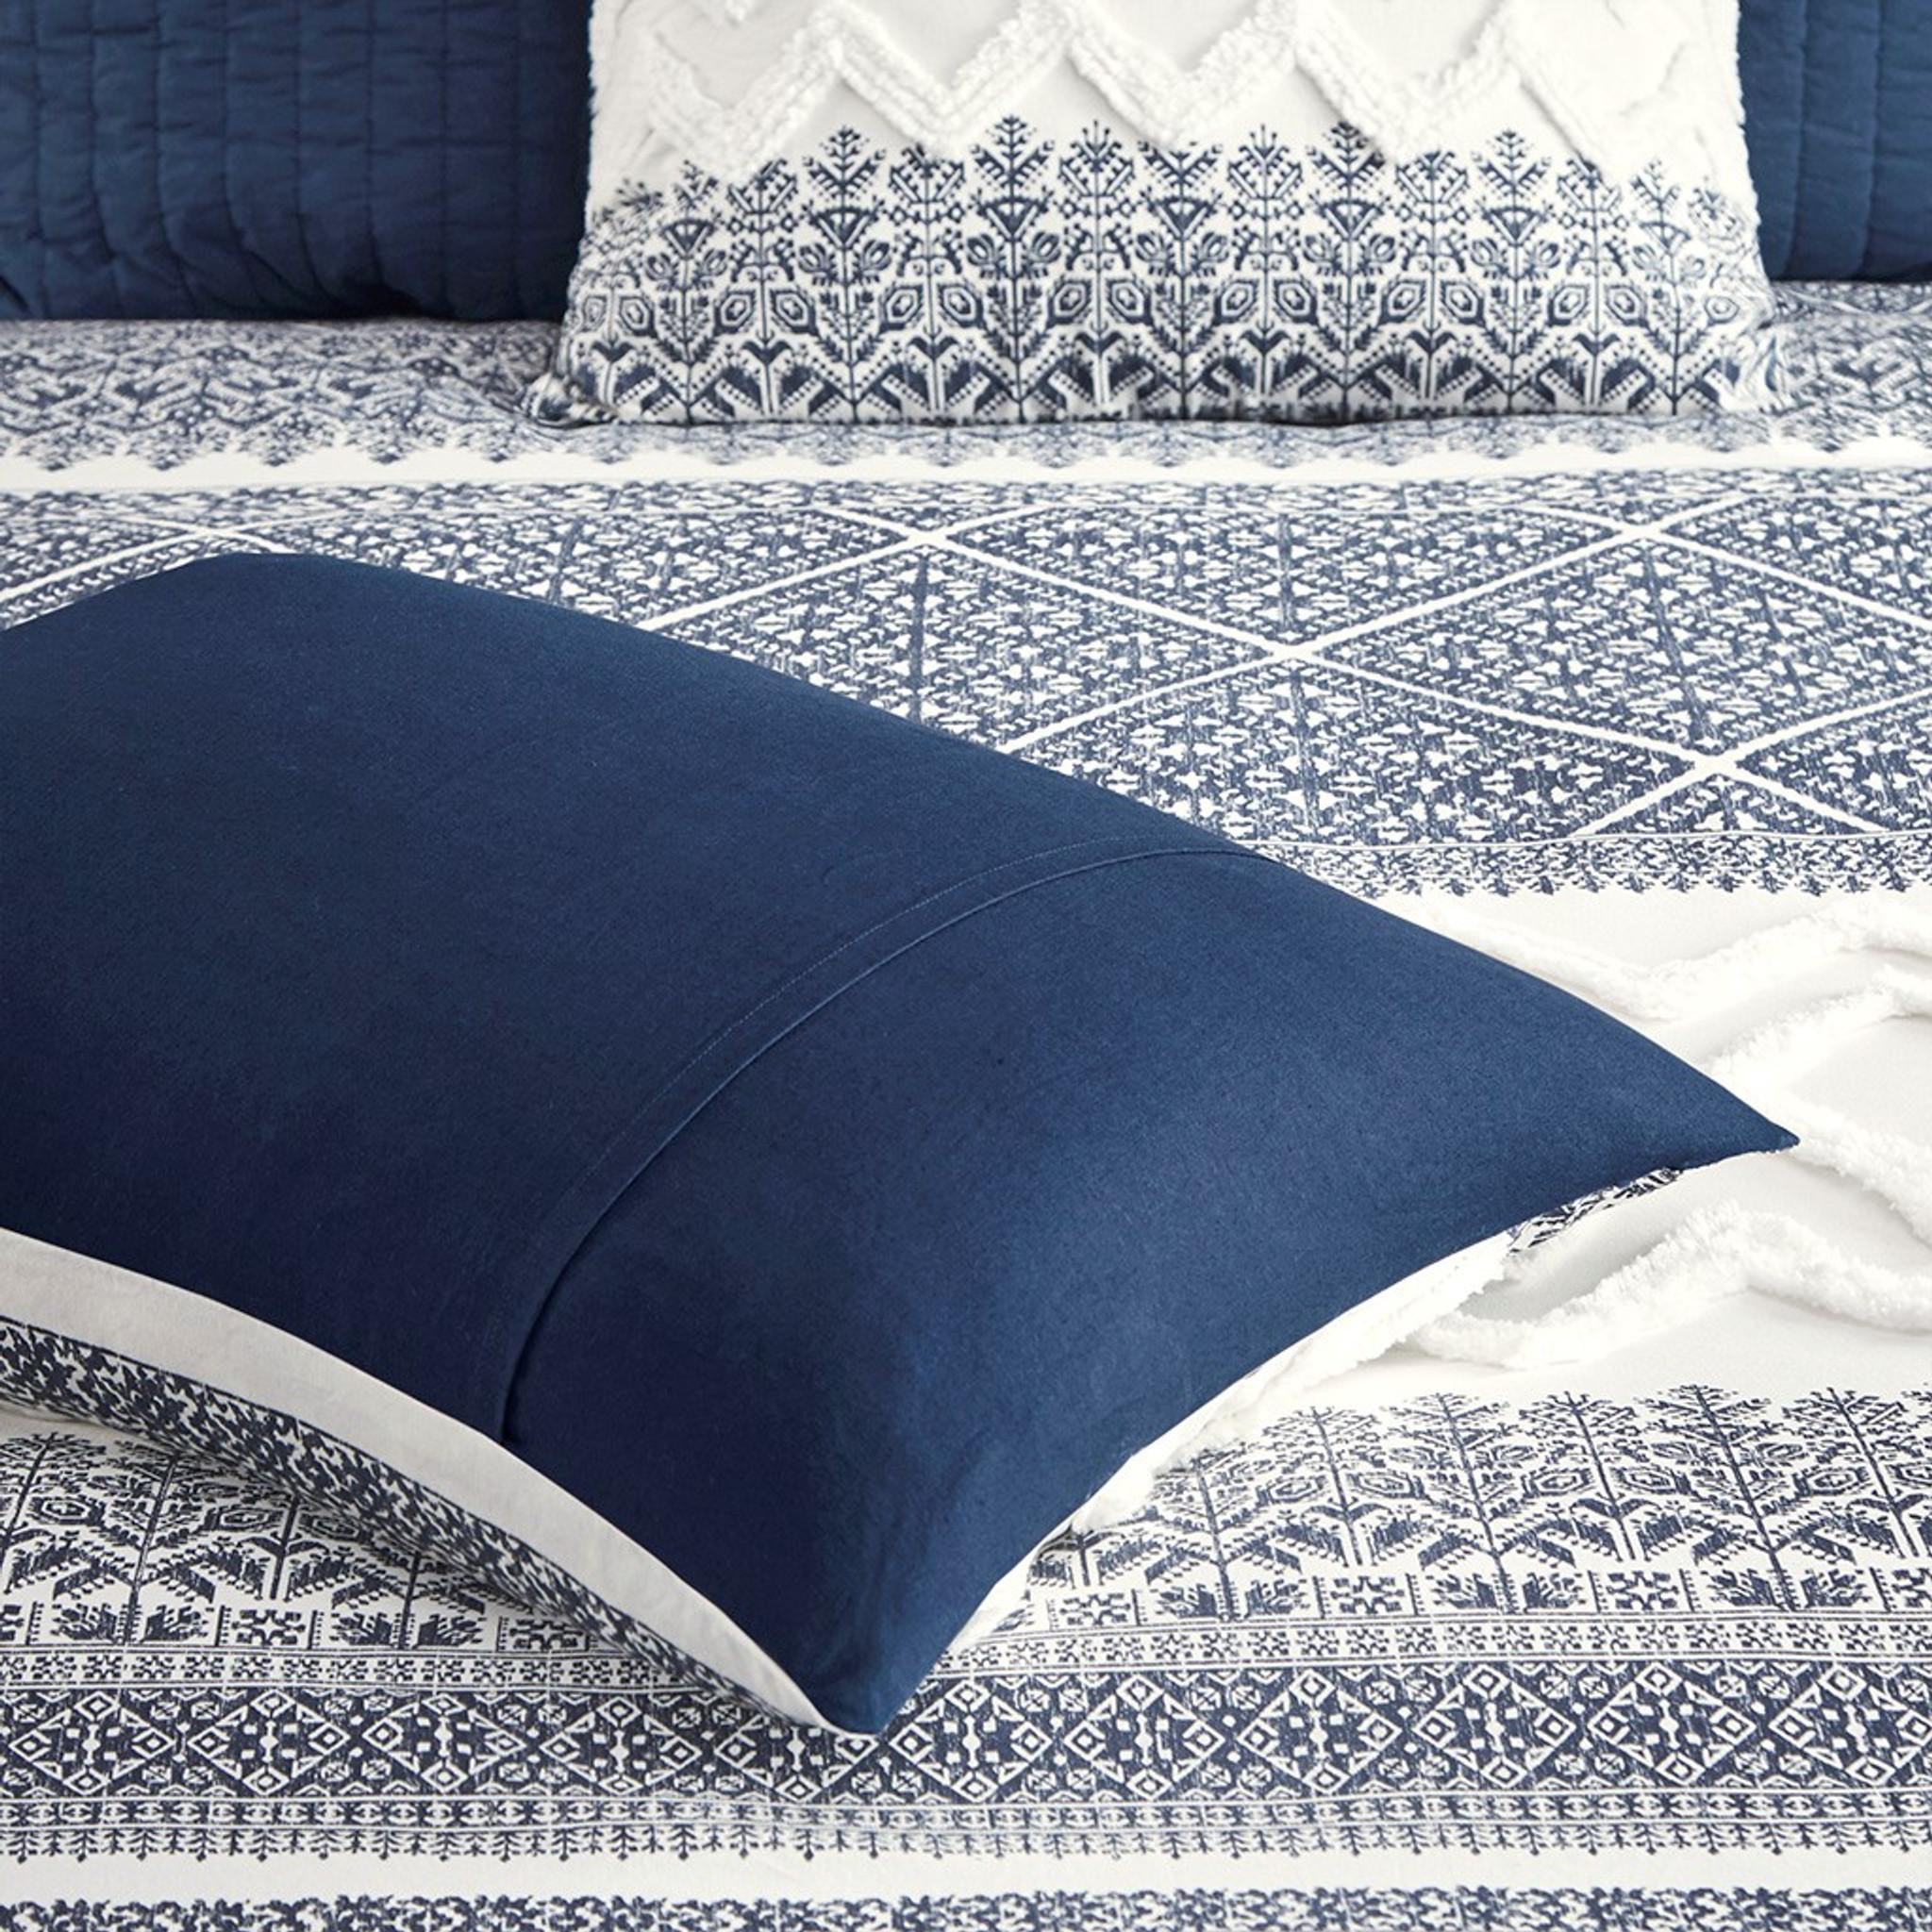 malibu boho navy and white comforter set queen